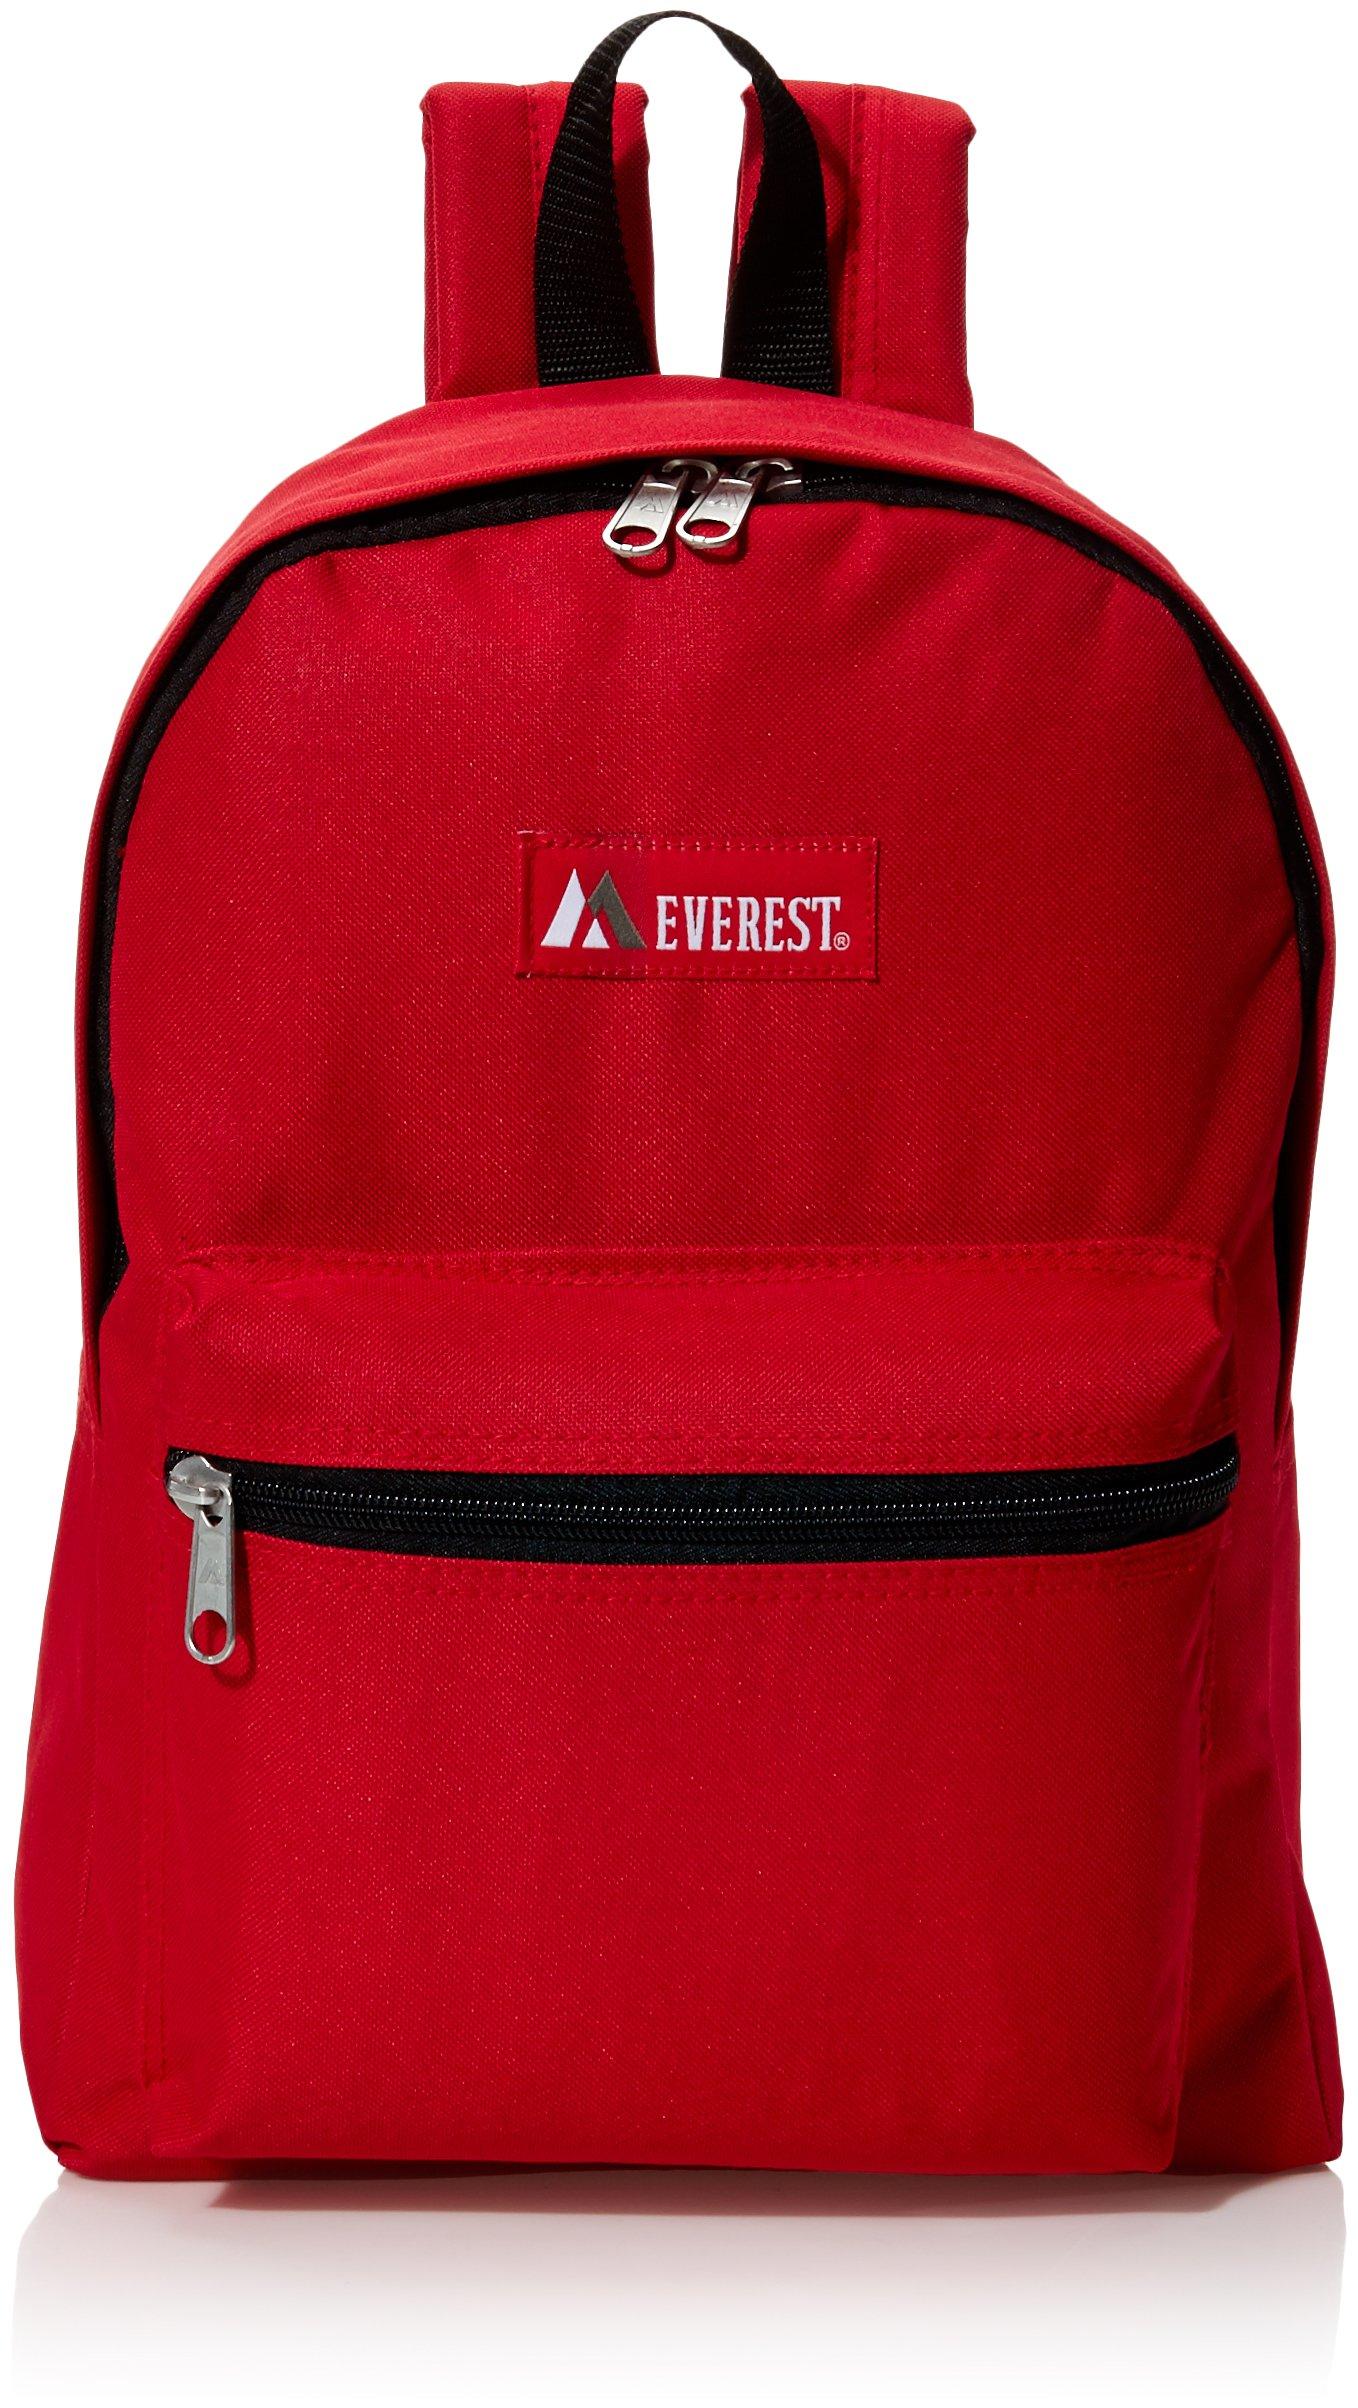 Everest Luggage Basic Backpack, Red, Medium by Everest